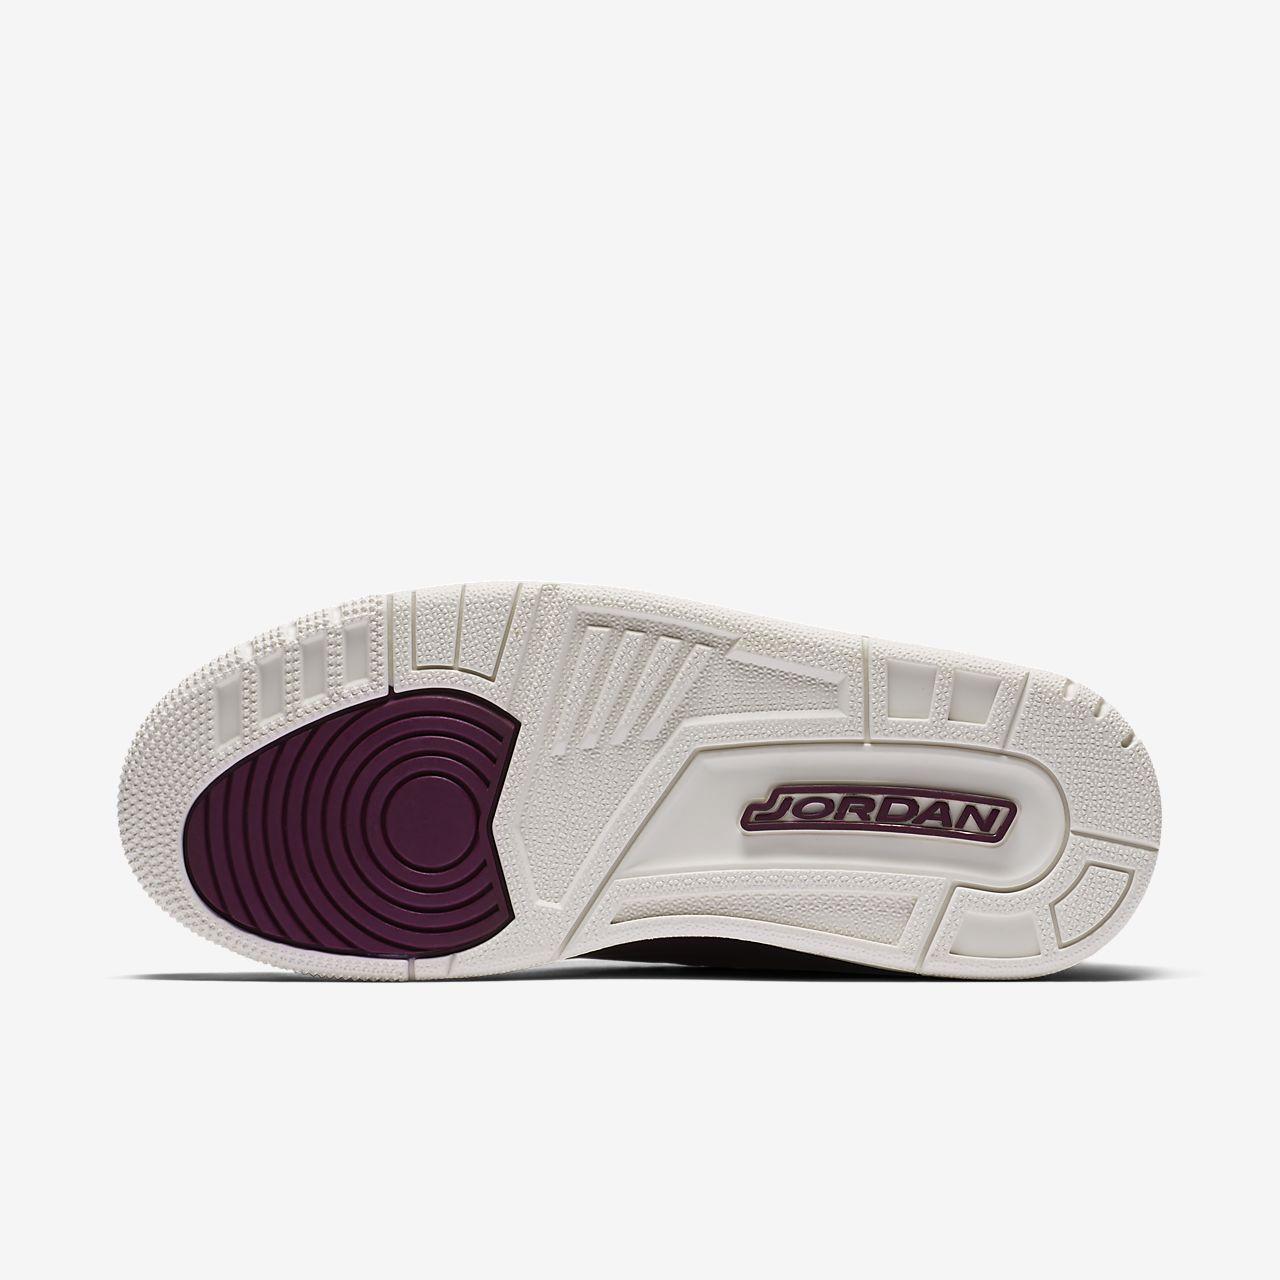 510983d3070928 Air Jordan 3 Retro SE Women s Shoe. Nike.com GB